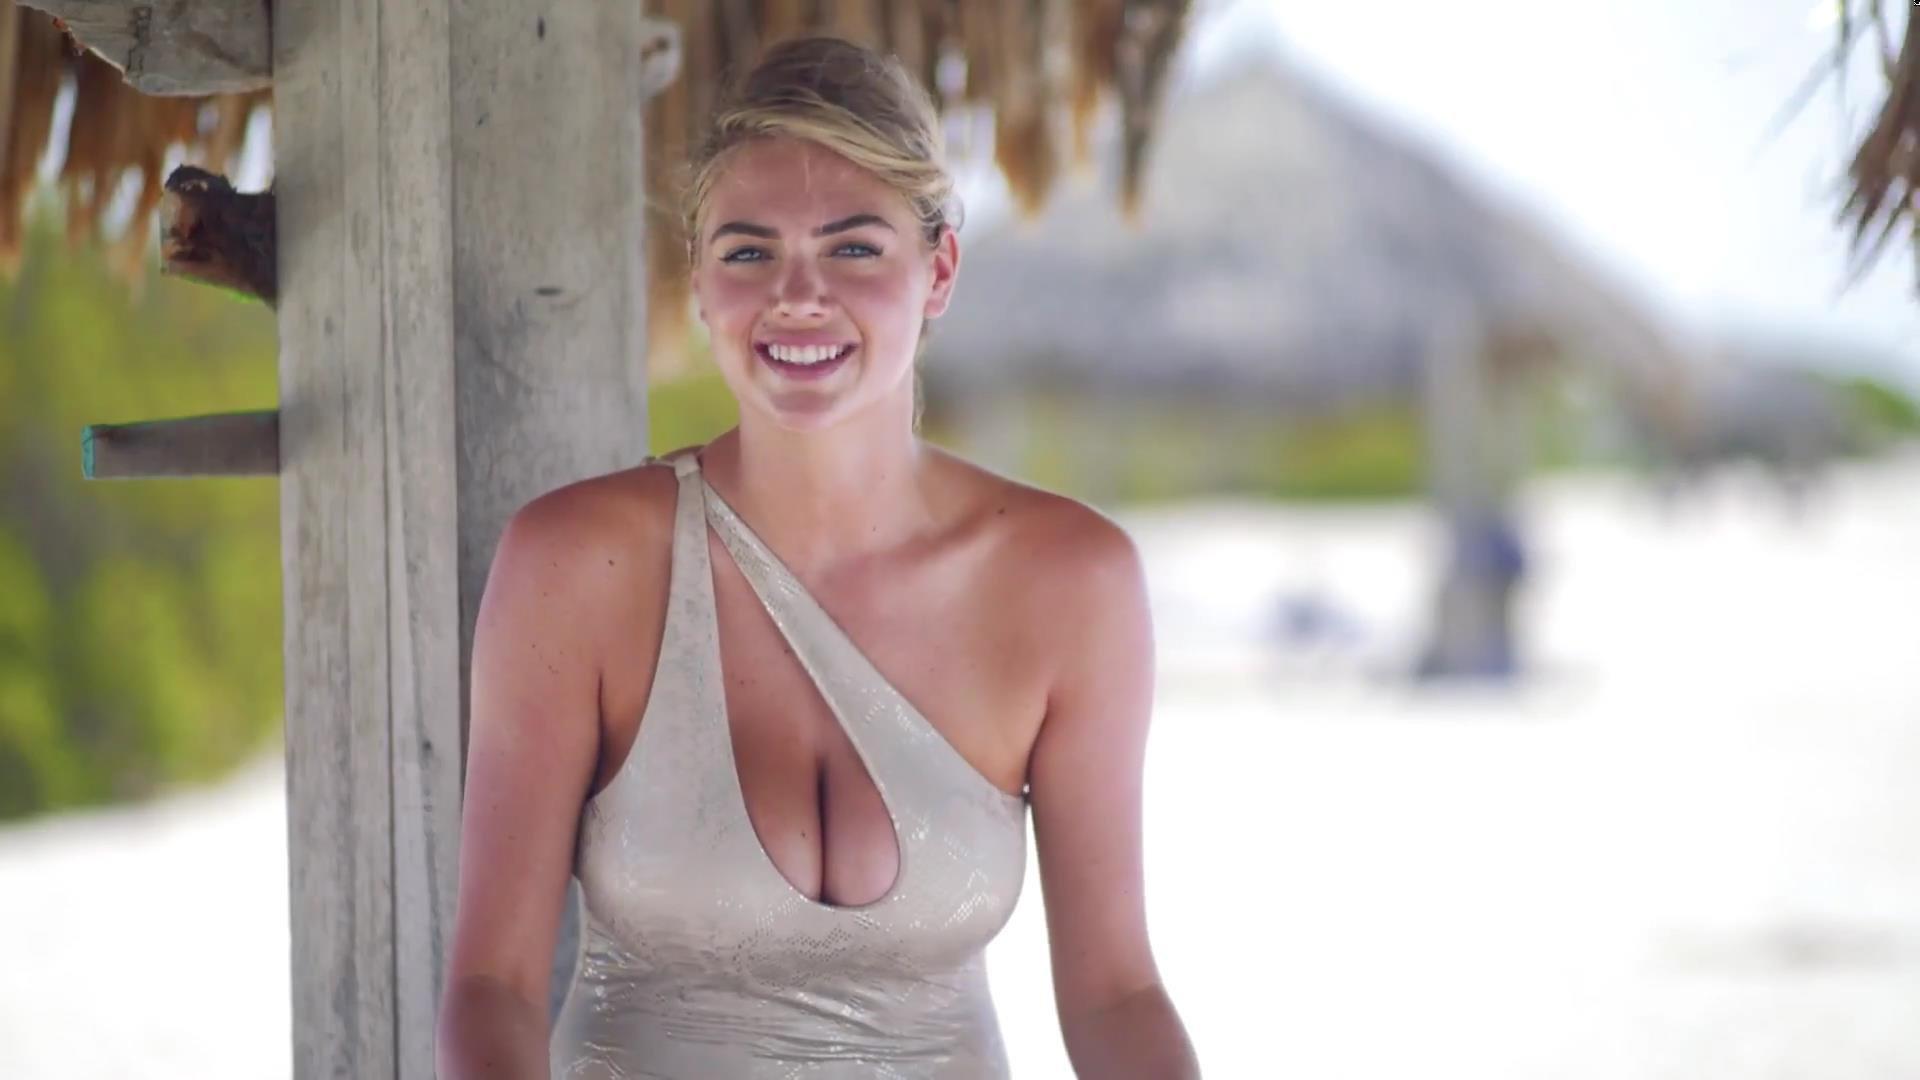 Kate Upton Celebrity Nipple Slips, Pussy Slips, Topless, See Thru Celebrityslips